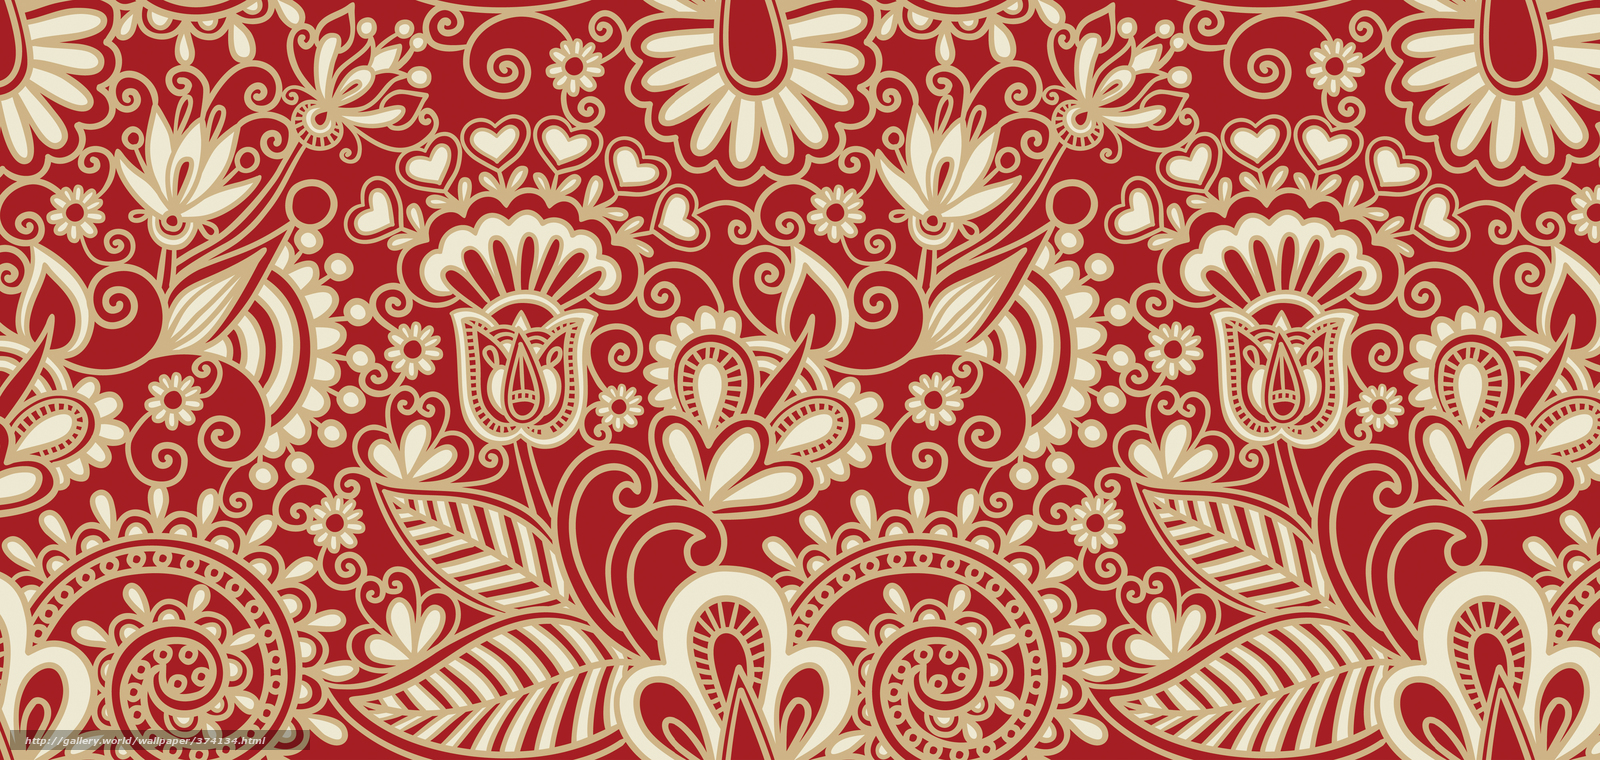 Текстура цветы узор узоры арт